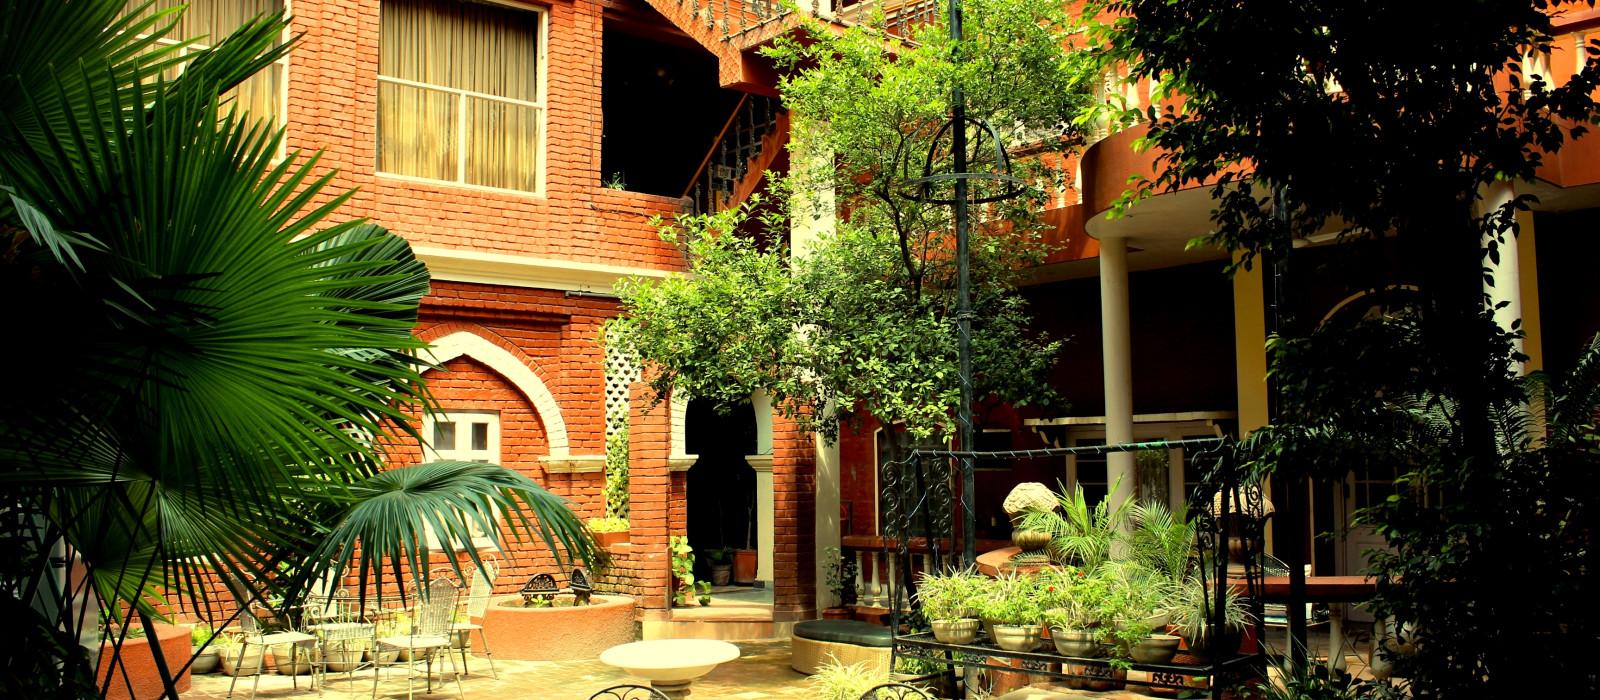 Hotel Ranjit's Svaasa North India